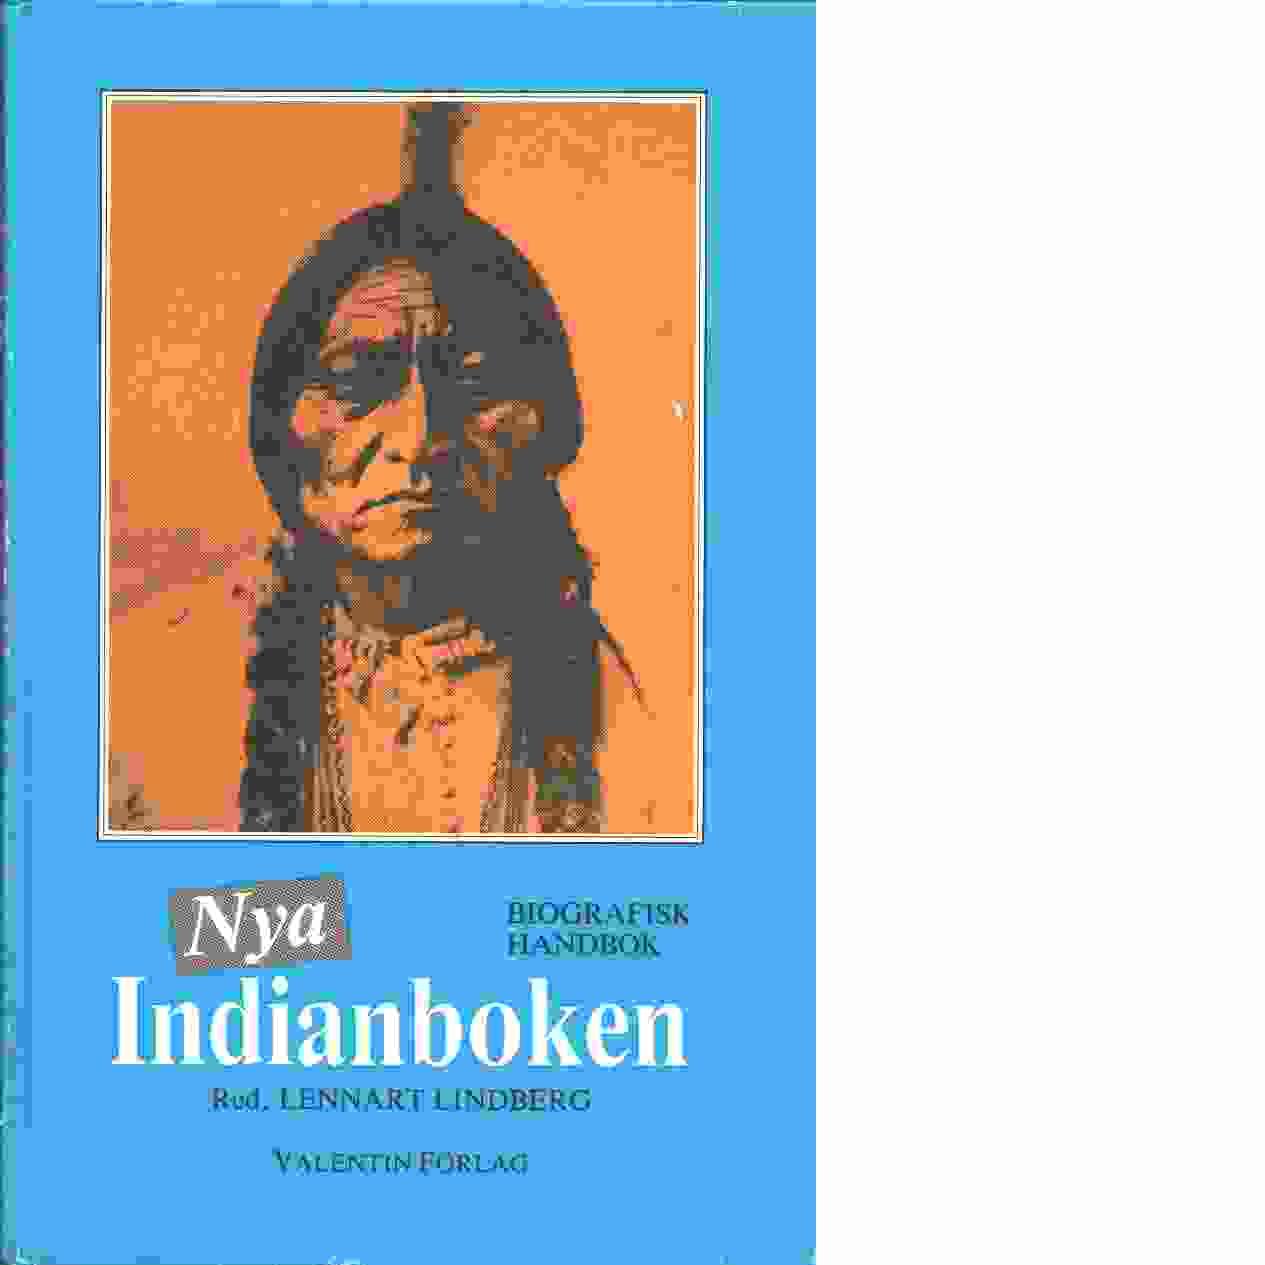 Nya Indianboken : biografisk handbok - Red. Lindberg, Lennart